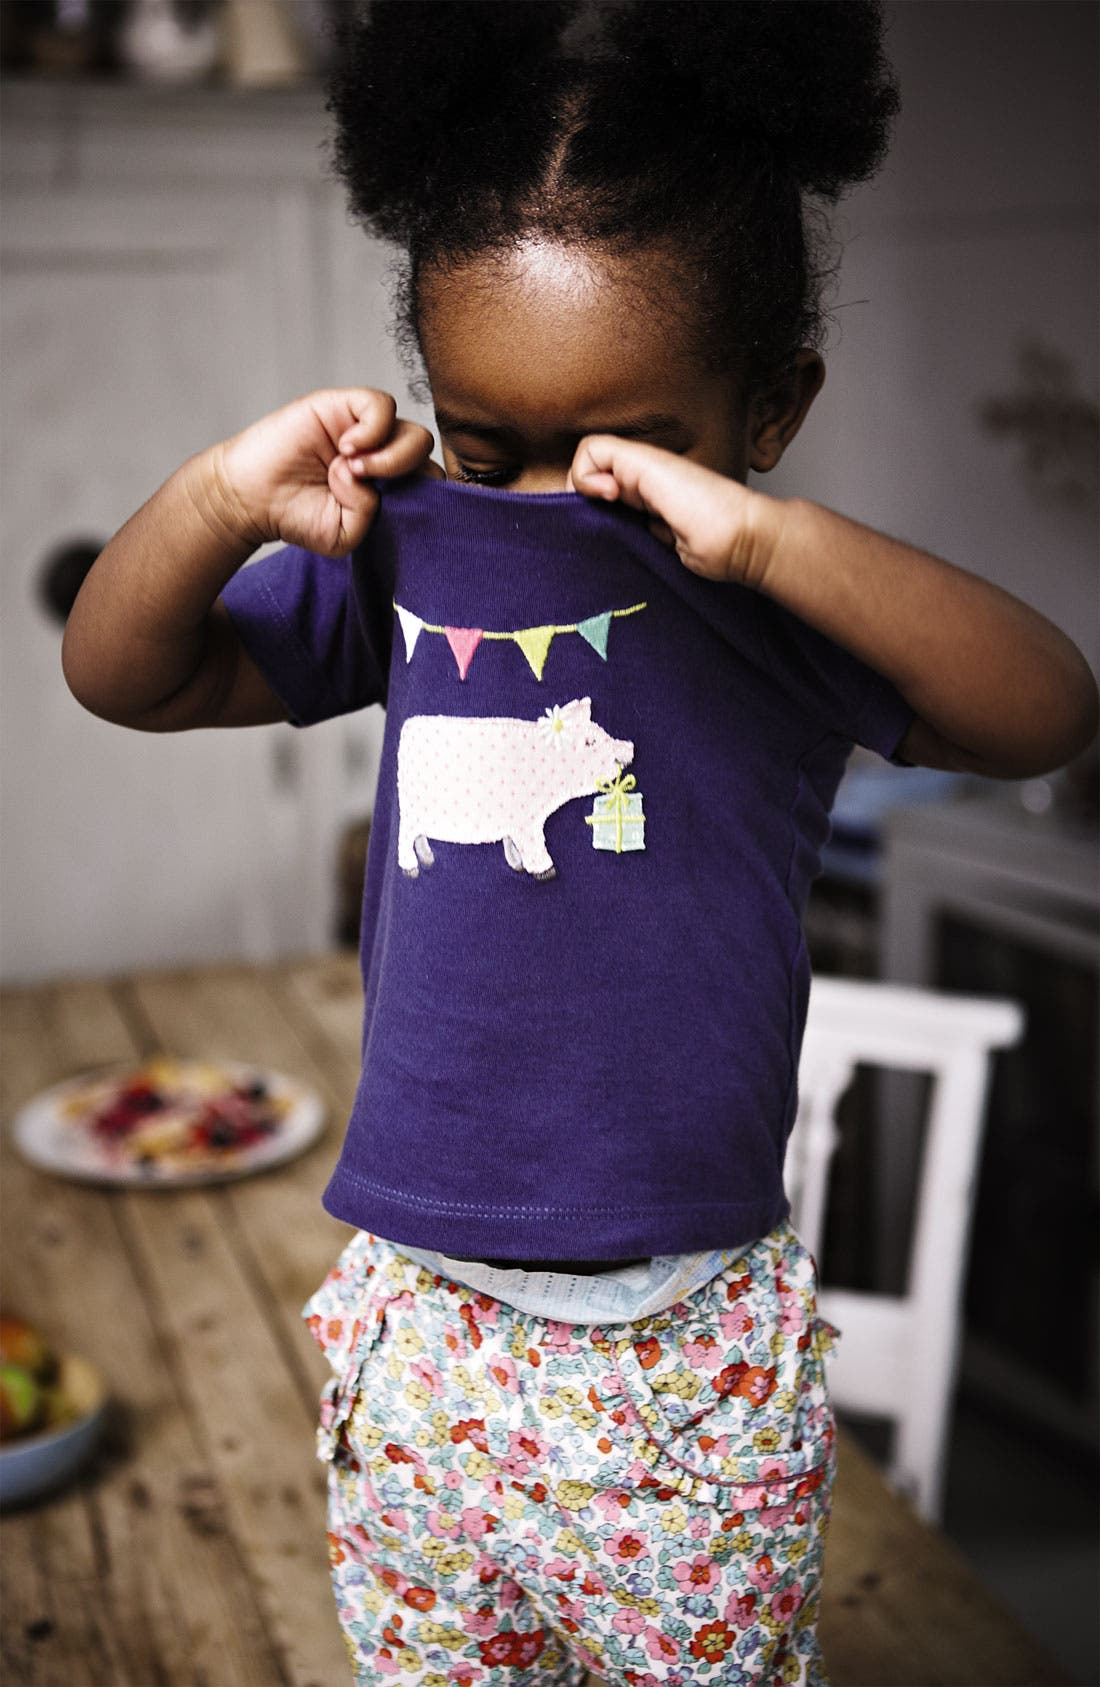 Alternate Image 2  - Mini Boden 'Party Animals' Tee (Baby)